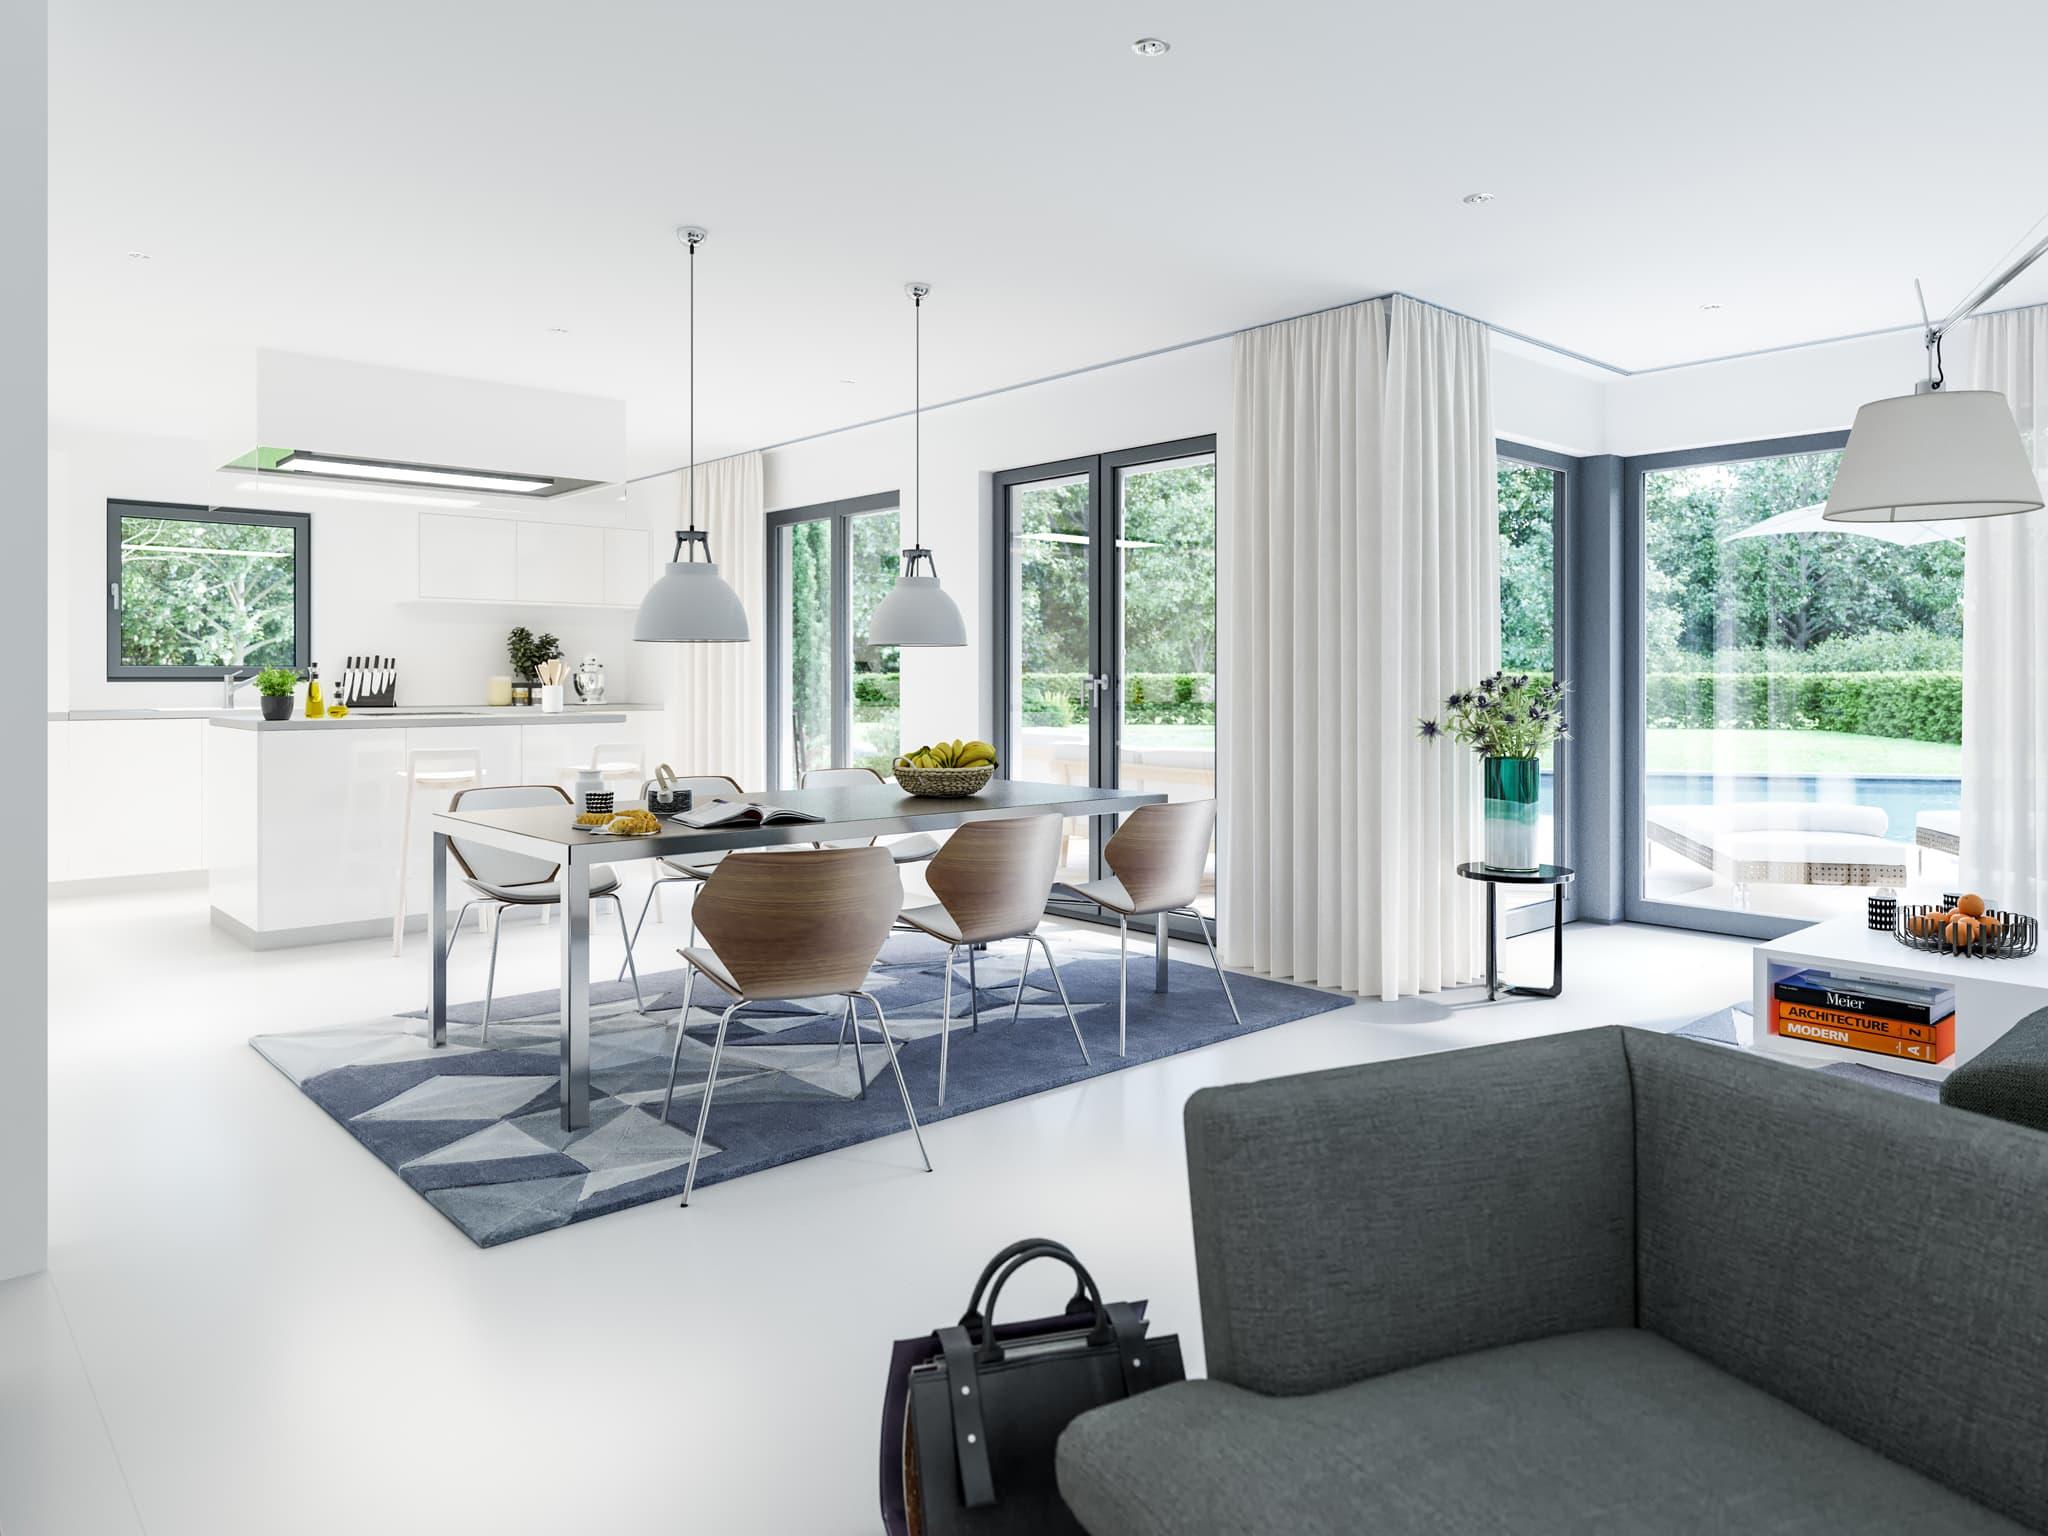 Wohn-Esszimmer mit Küche offen - Ideen Stadtvilla Inneneinrichtung modern Fertighaus Living Haus SUNSHINE 143 V6 - HausbauDirekt.de